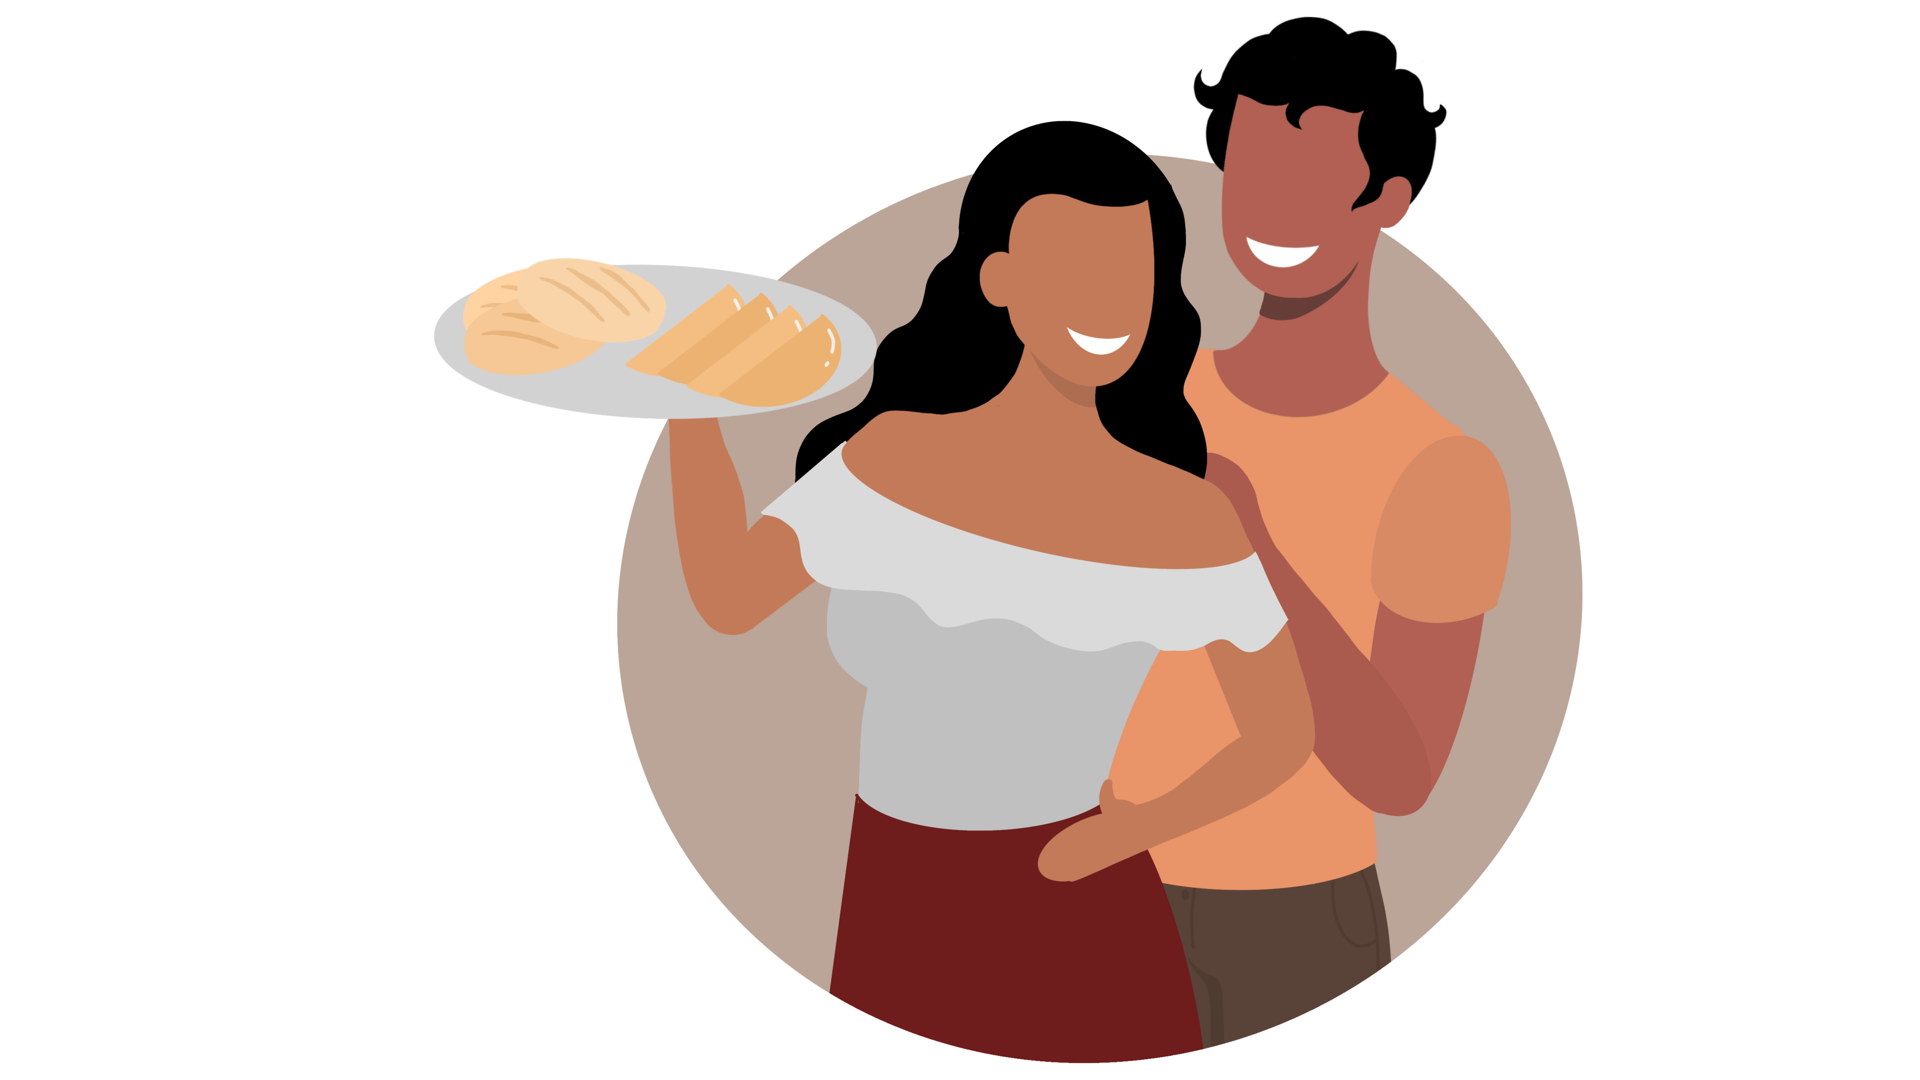 Latin cupid dating who is doug brochu dating